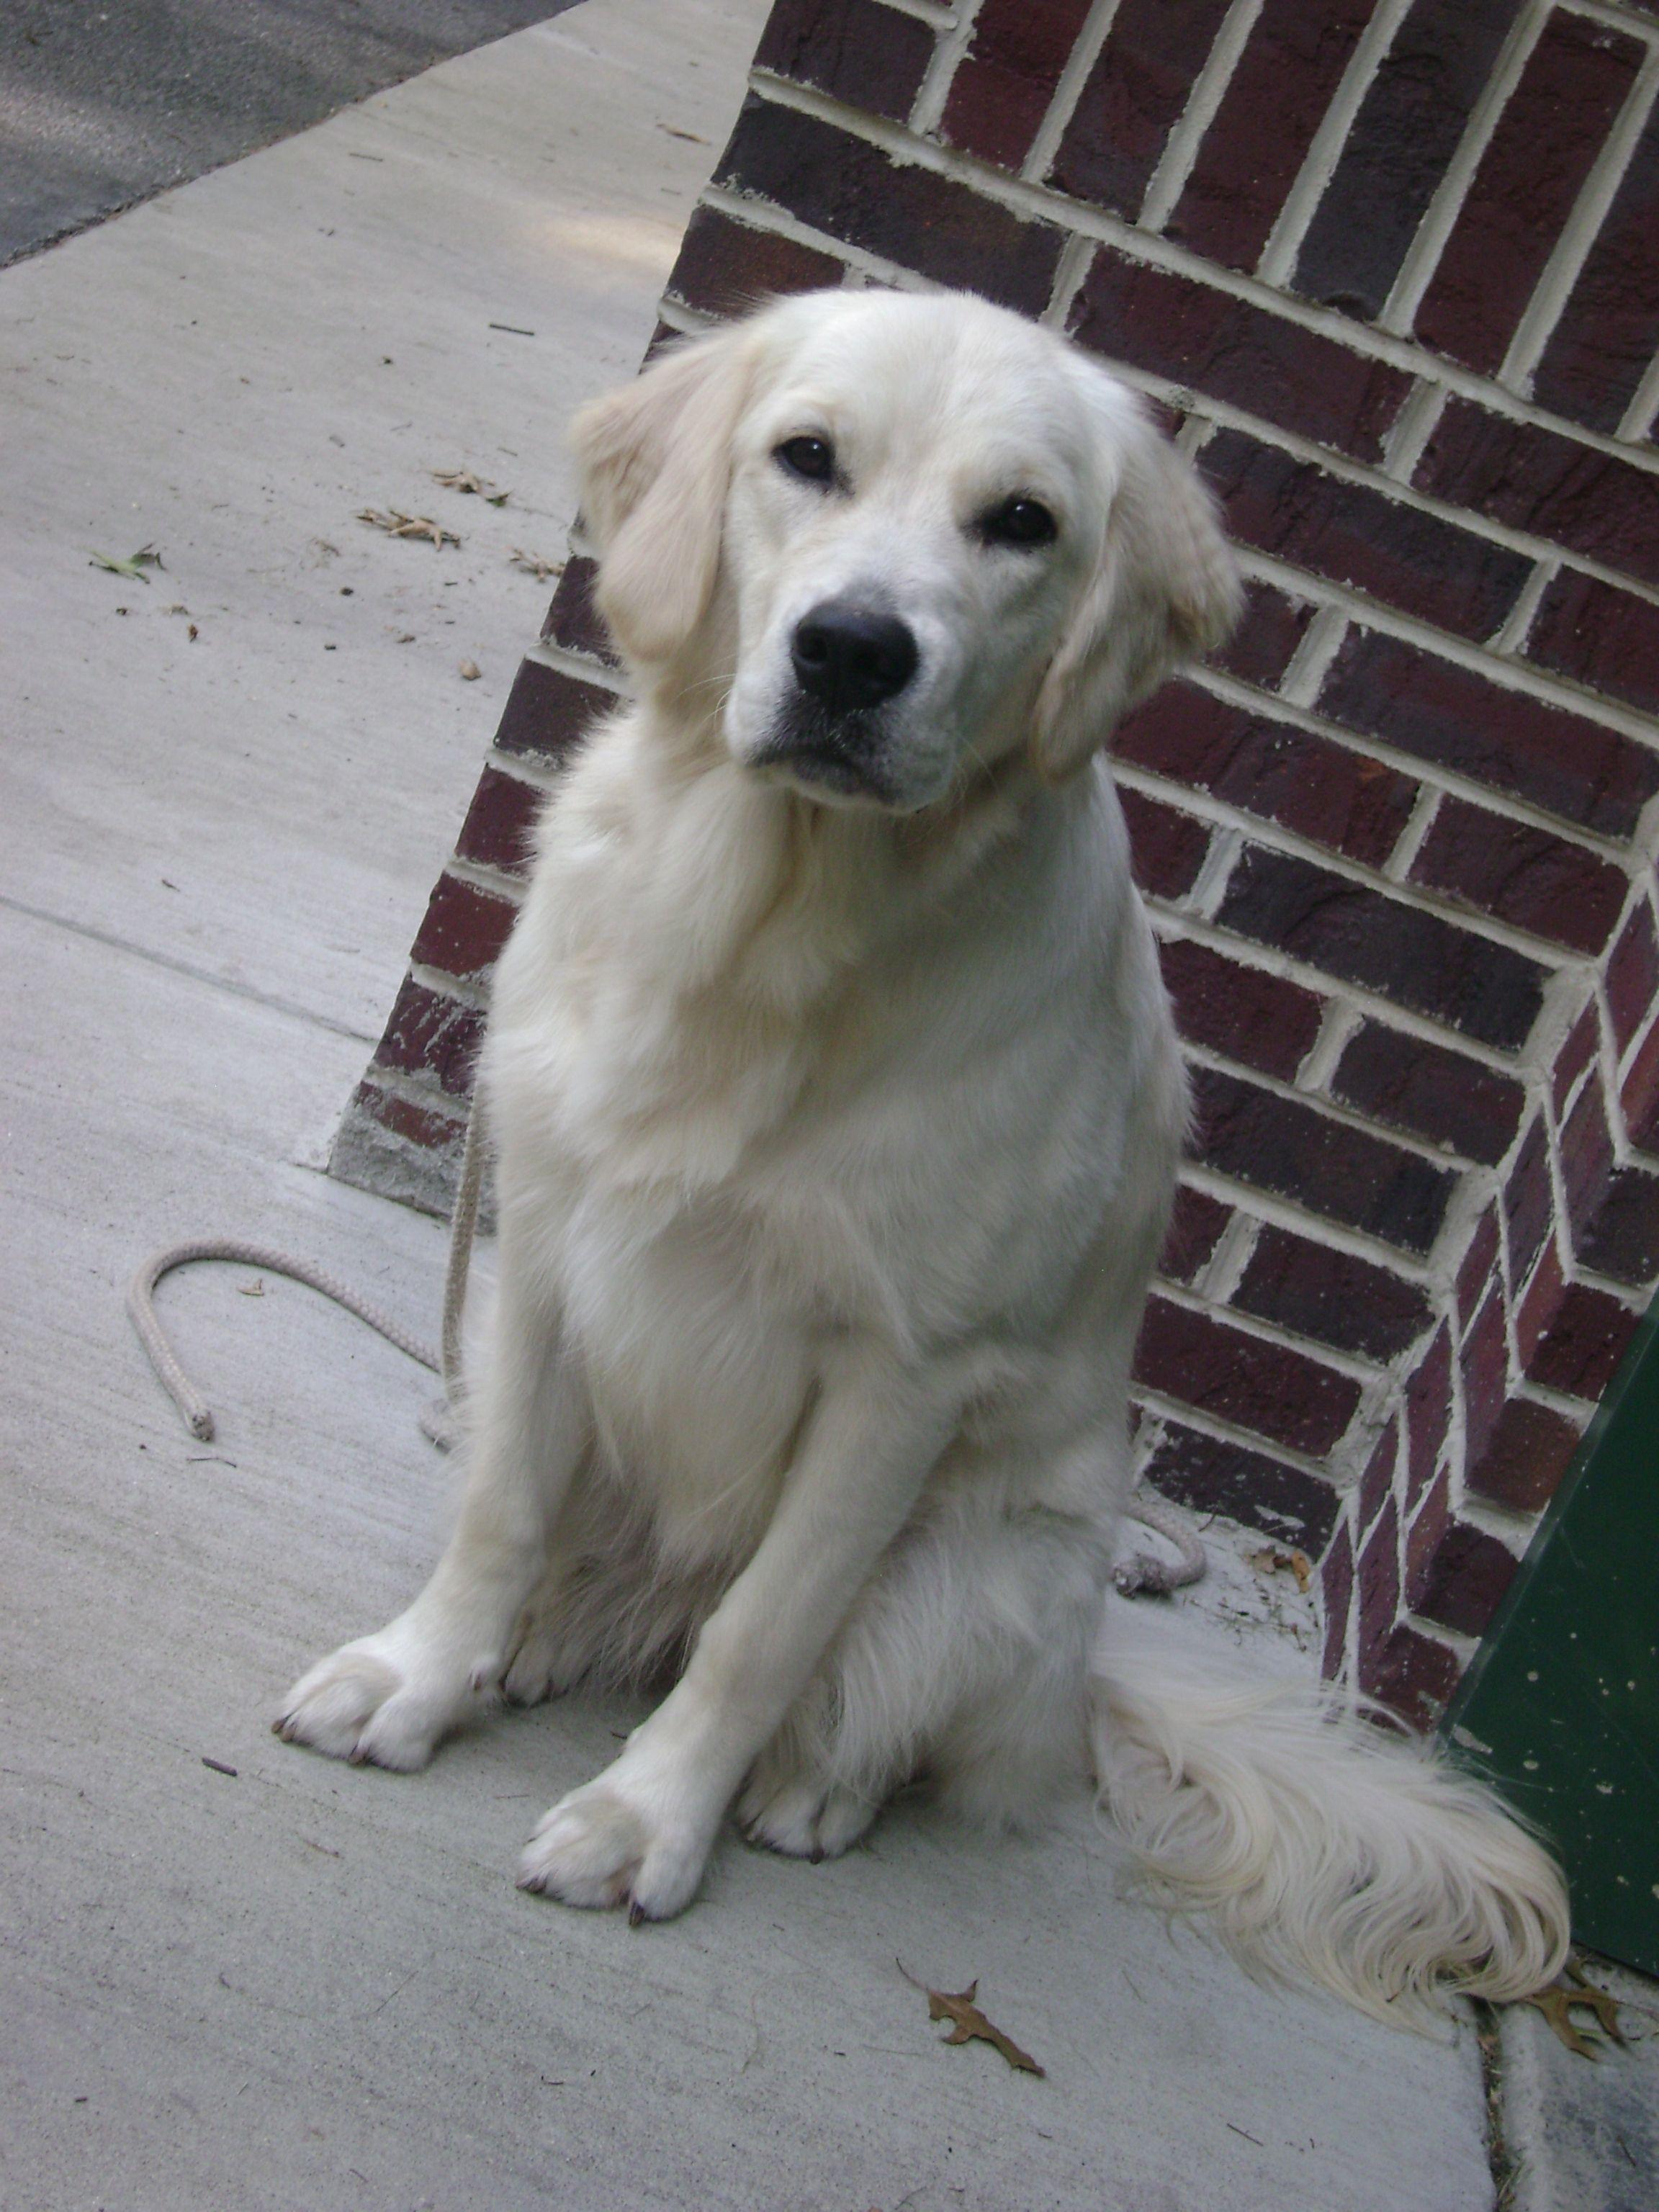 The Dog Of My Dreams An English Cream Golden Retriever Beautiful Dog Breeds English Retriever Beautiful Dogs